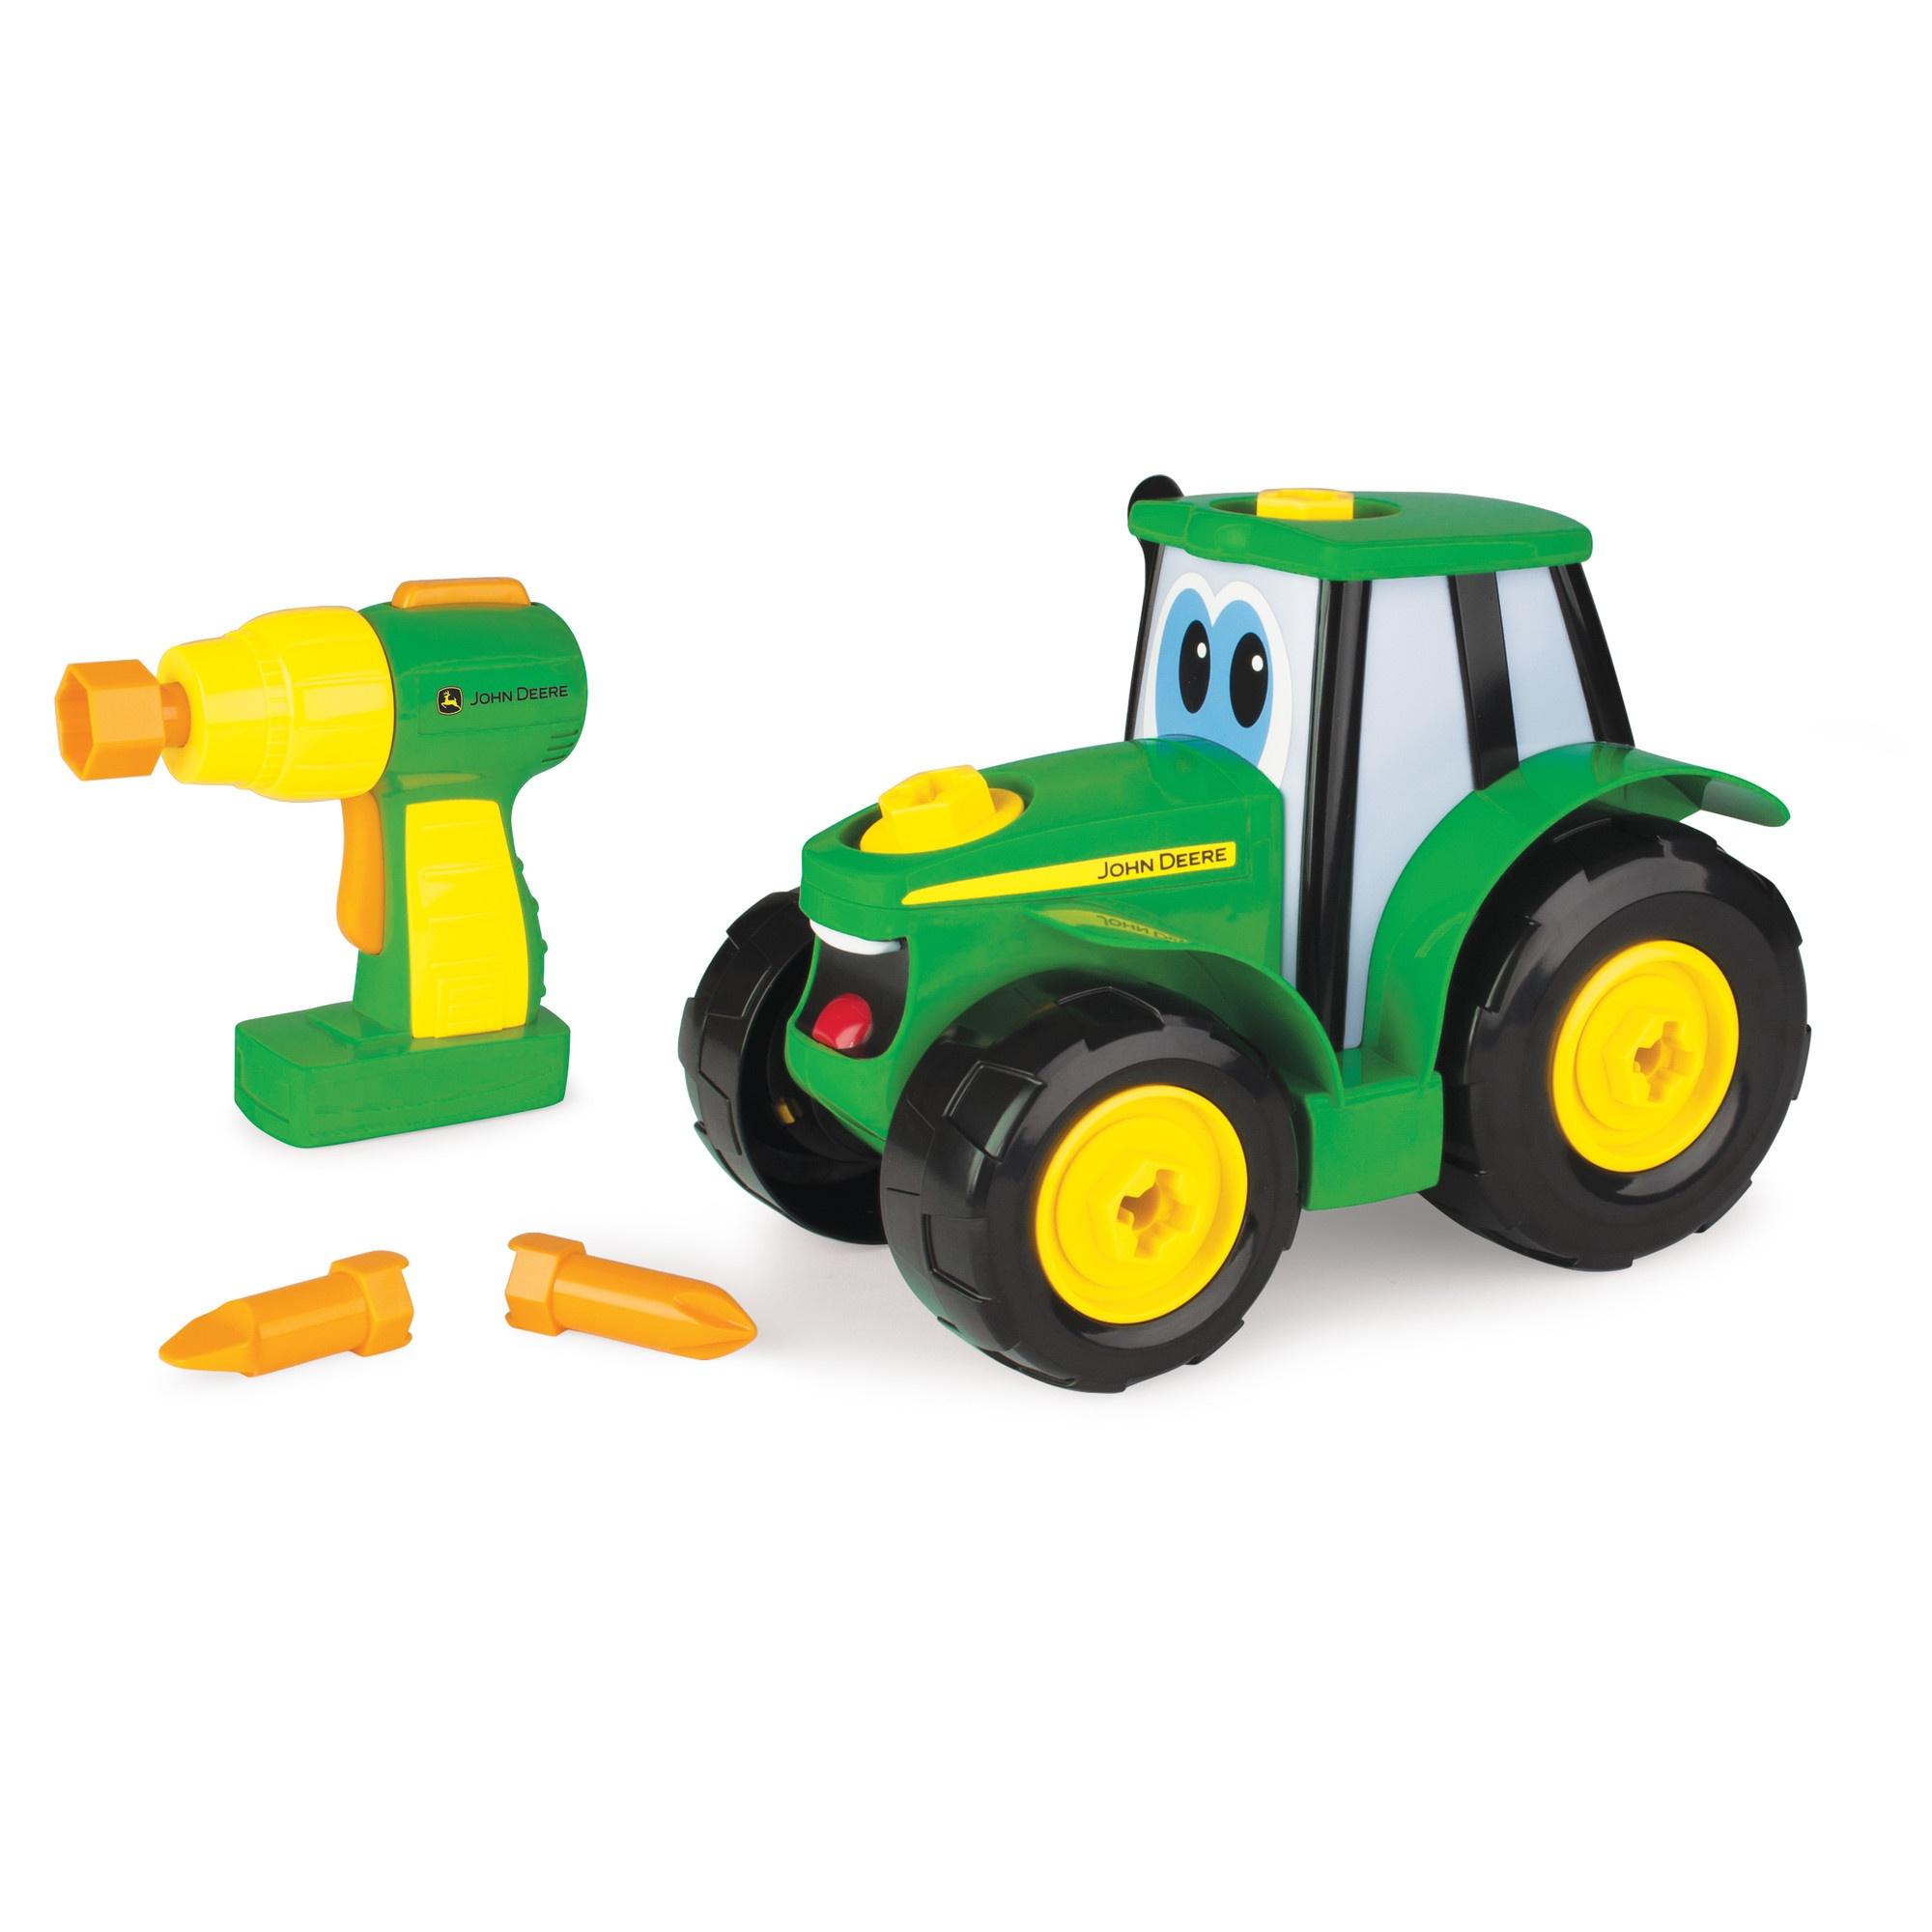 John Deere Johnny Tractor, byg en traktor